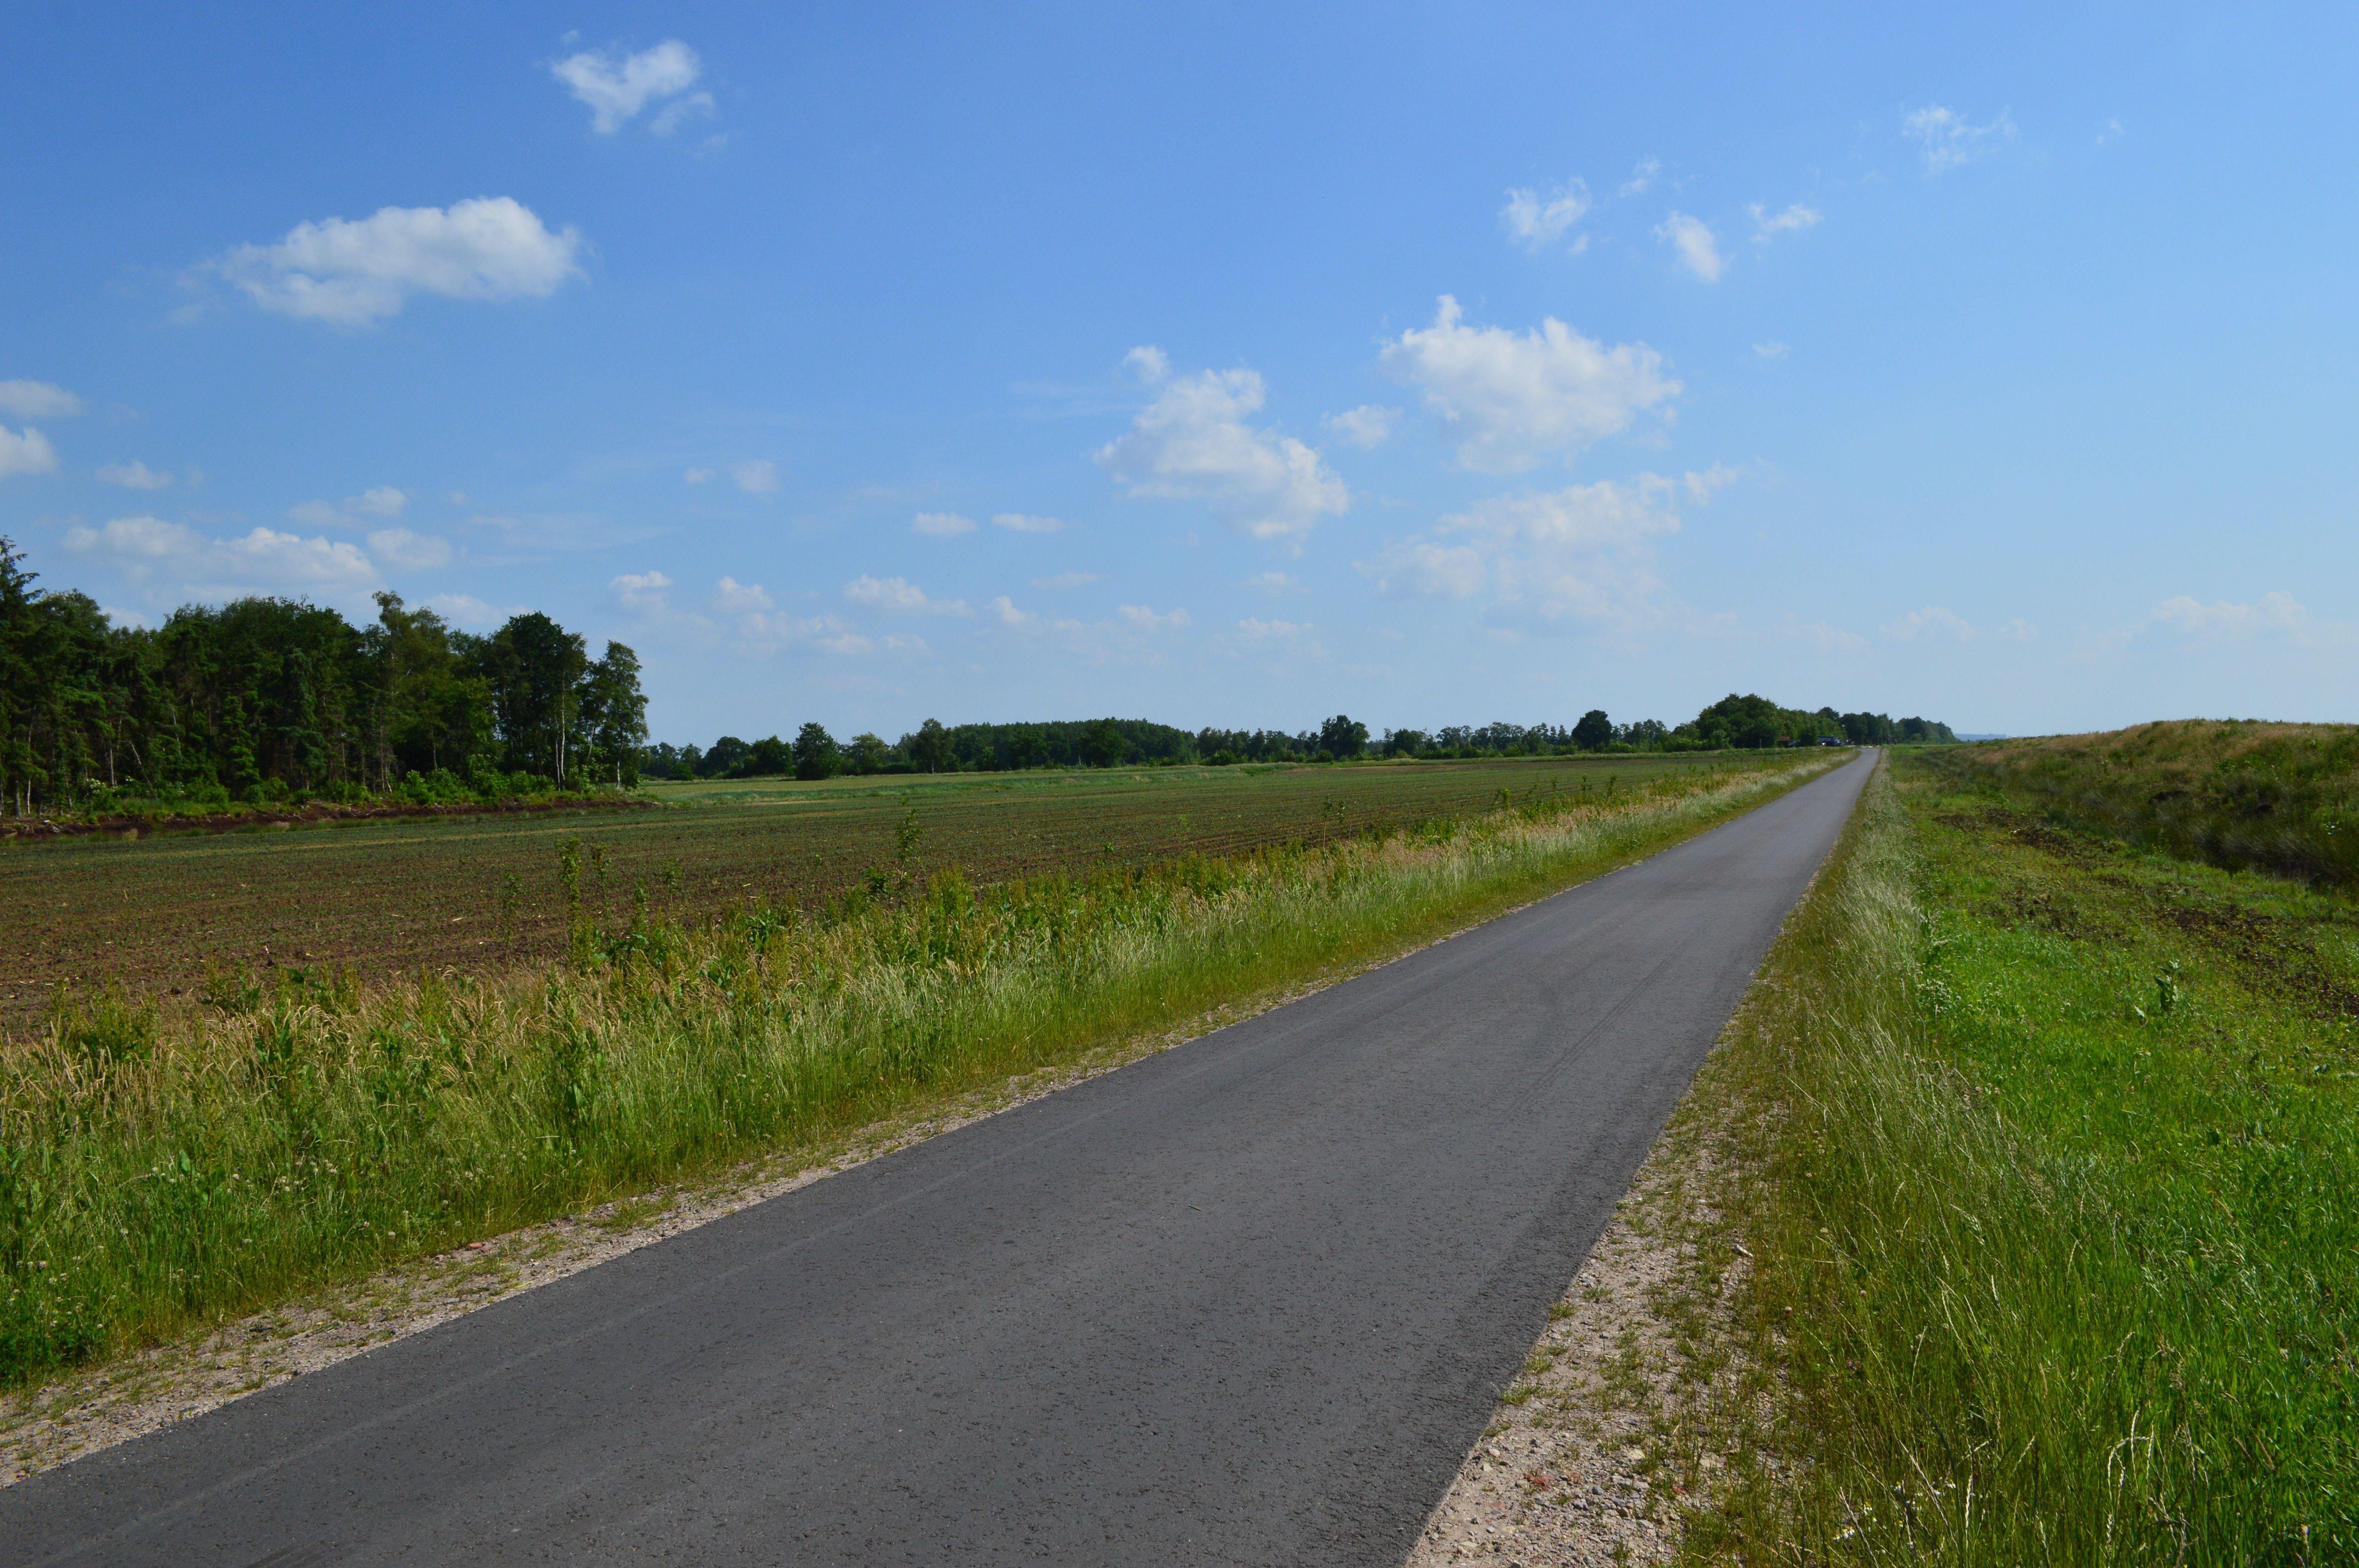 Endlose Weite Lange Wege Fahrradweg Moorerlebnisroute Ostfriesland Emsland Oldenburger Munsterland Niedersachsen Moorgebiet Fahrradwege Erlebnis Fahren